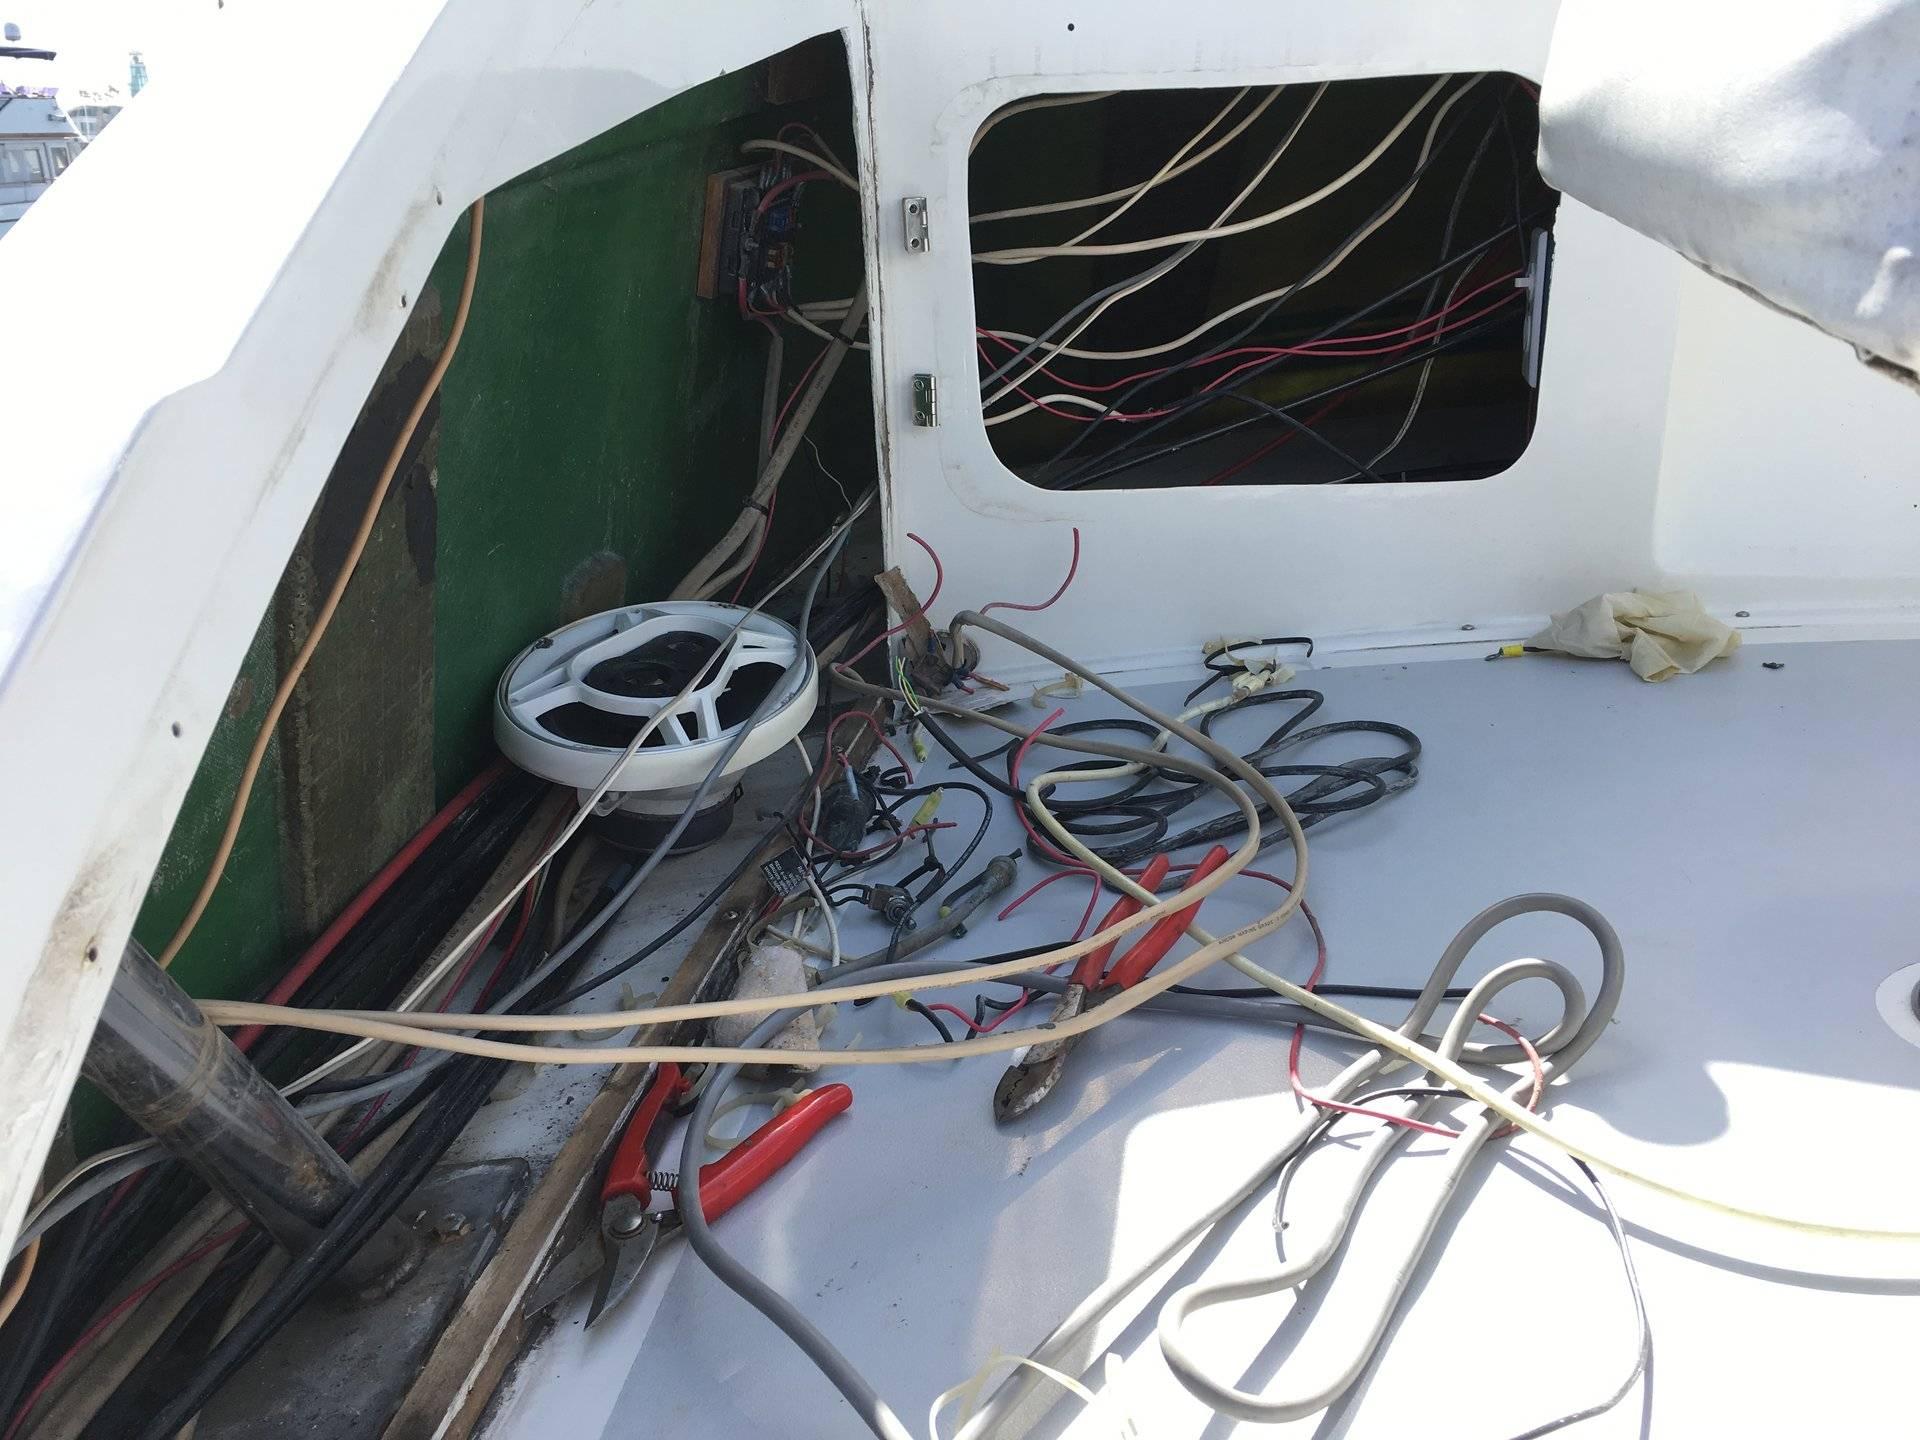 28 Bertram Work In Progress Bloodydecks Boat Wiring Job Img 4215